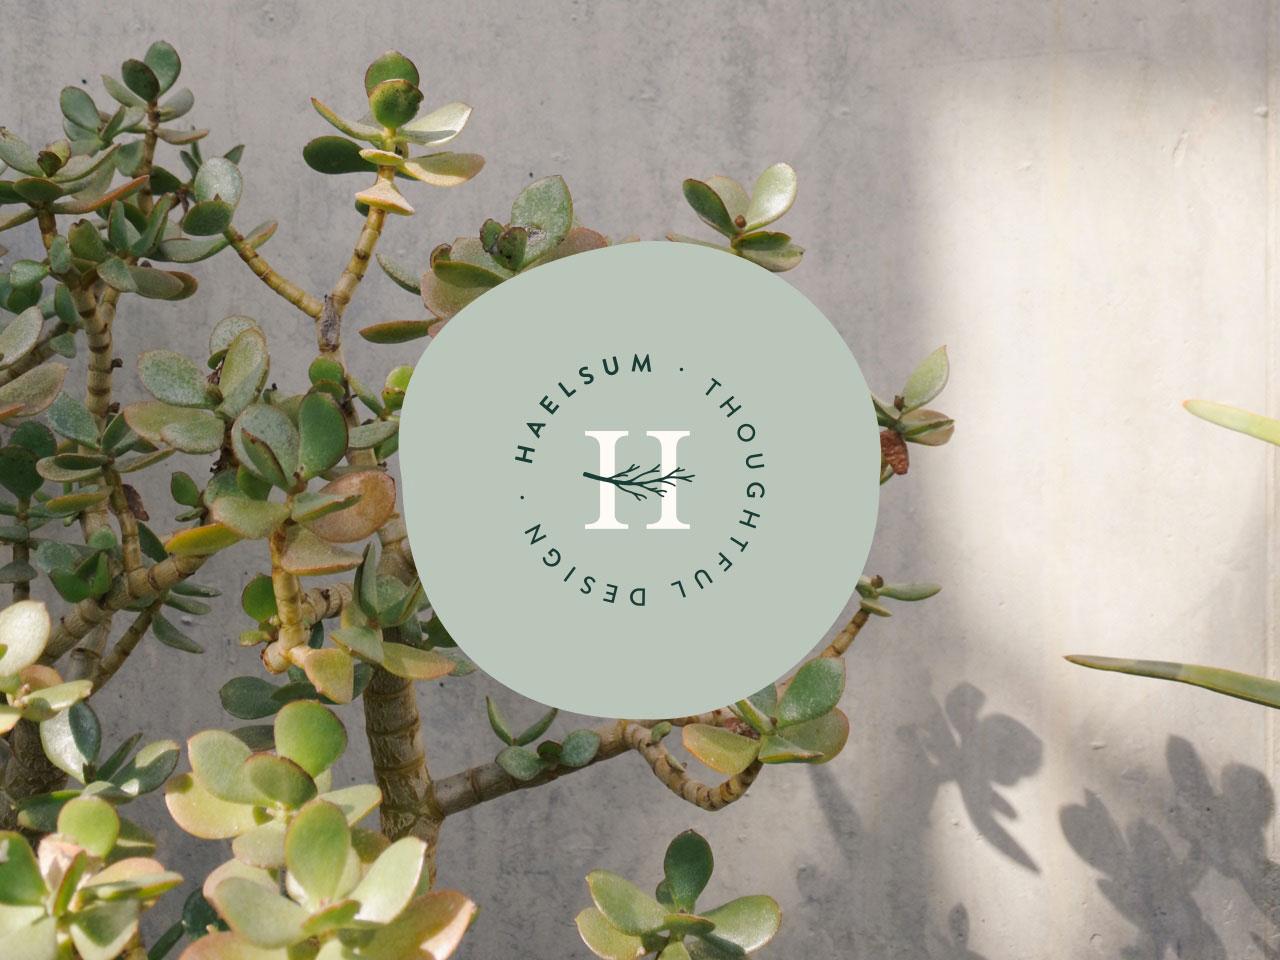 blog-welcome-haelsum